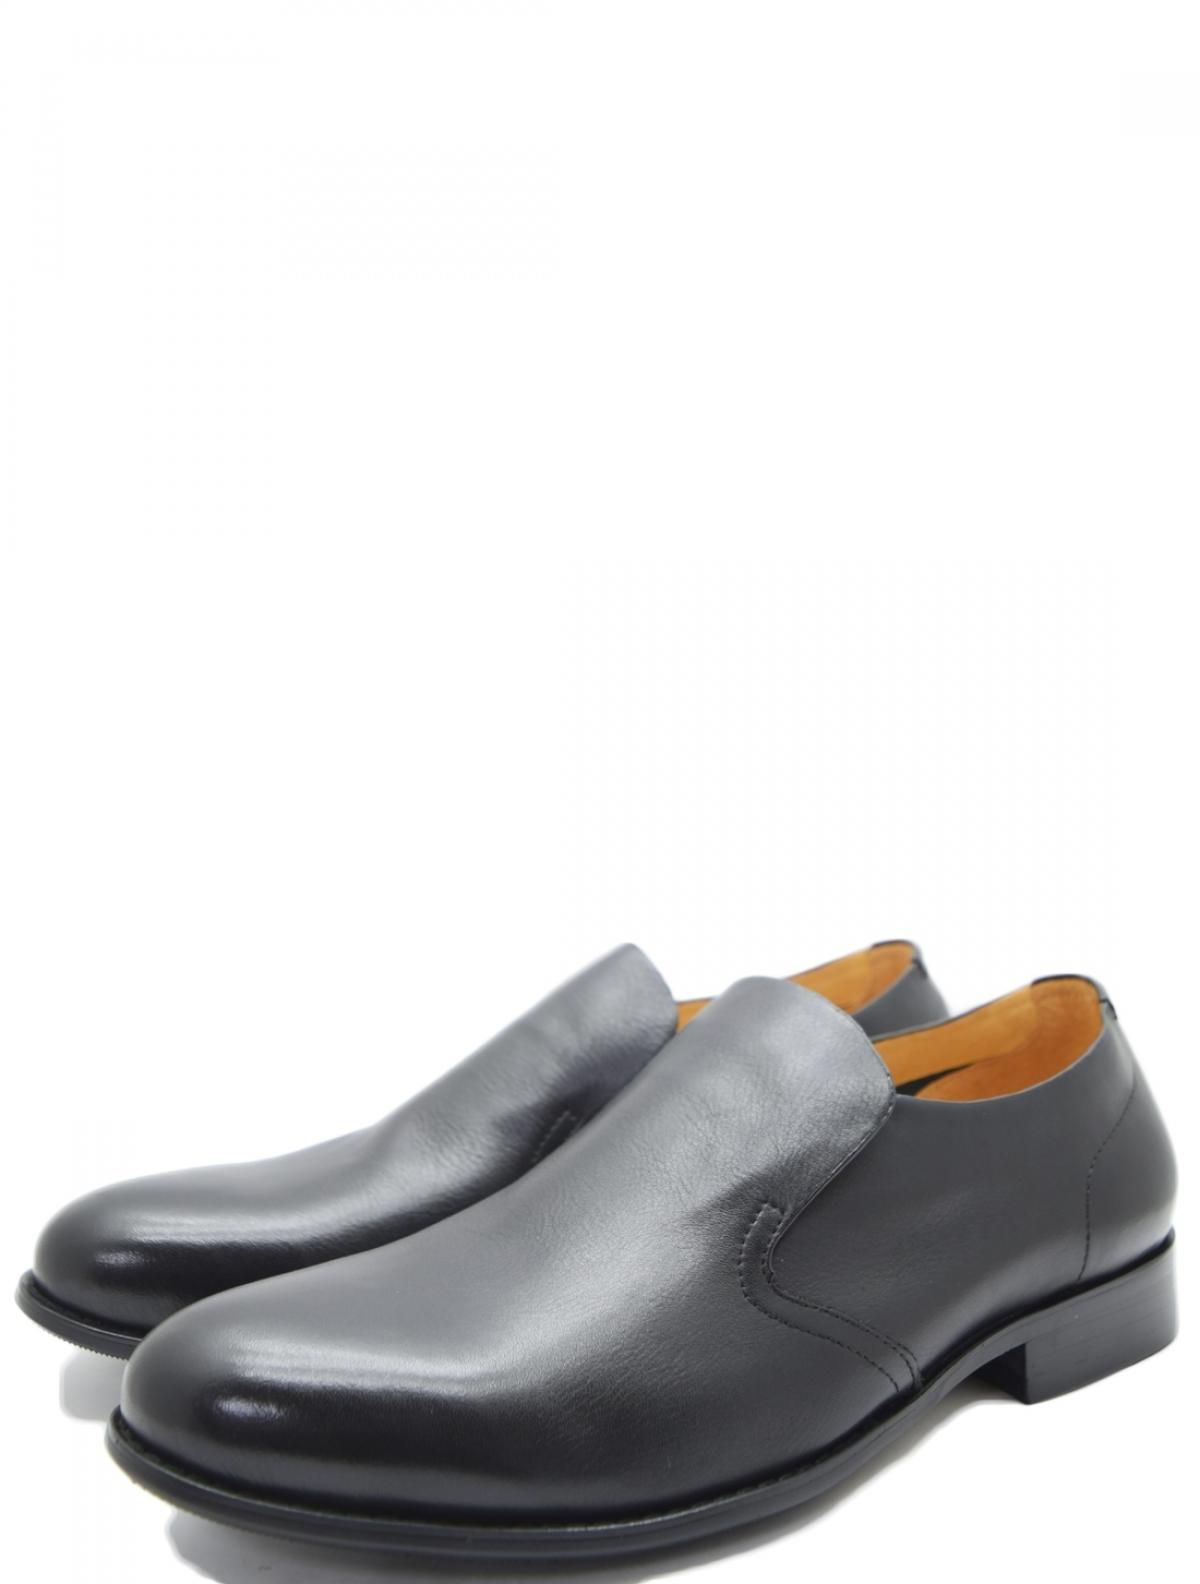 Rosconi R73002-428-9362 мужские туфли